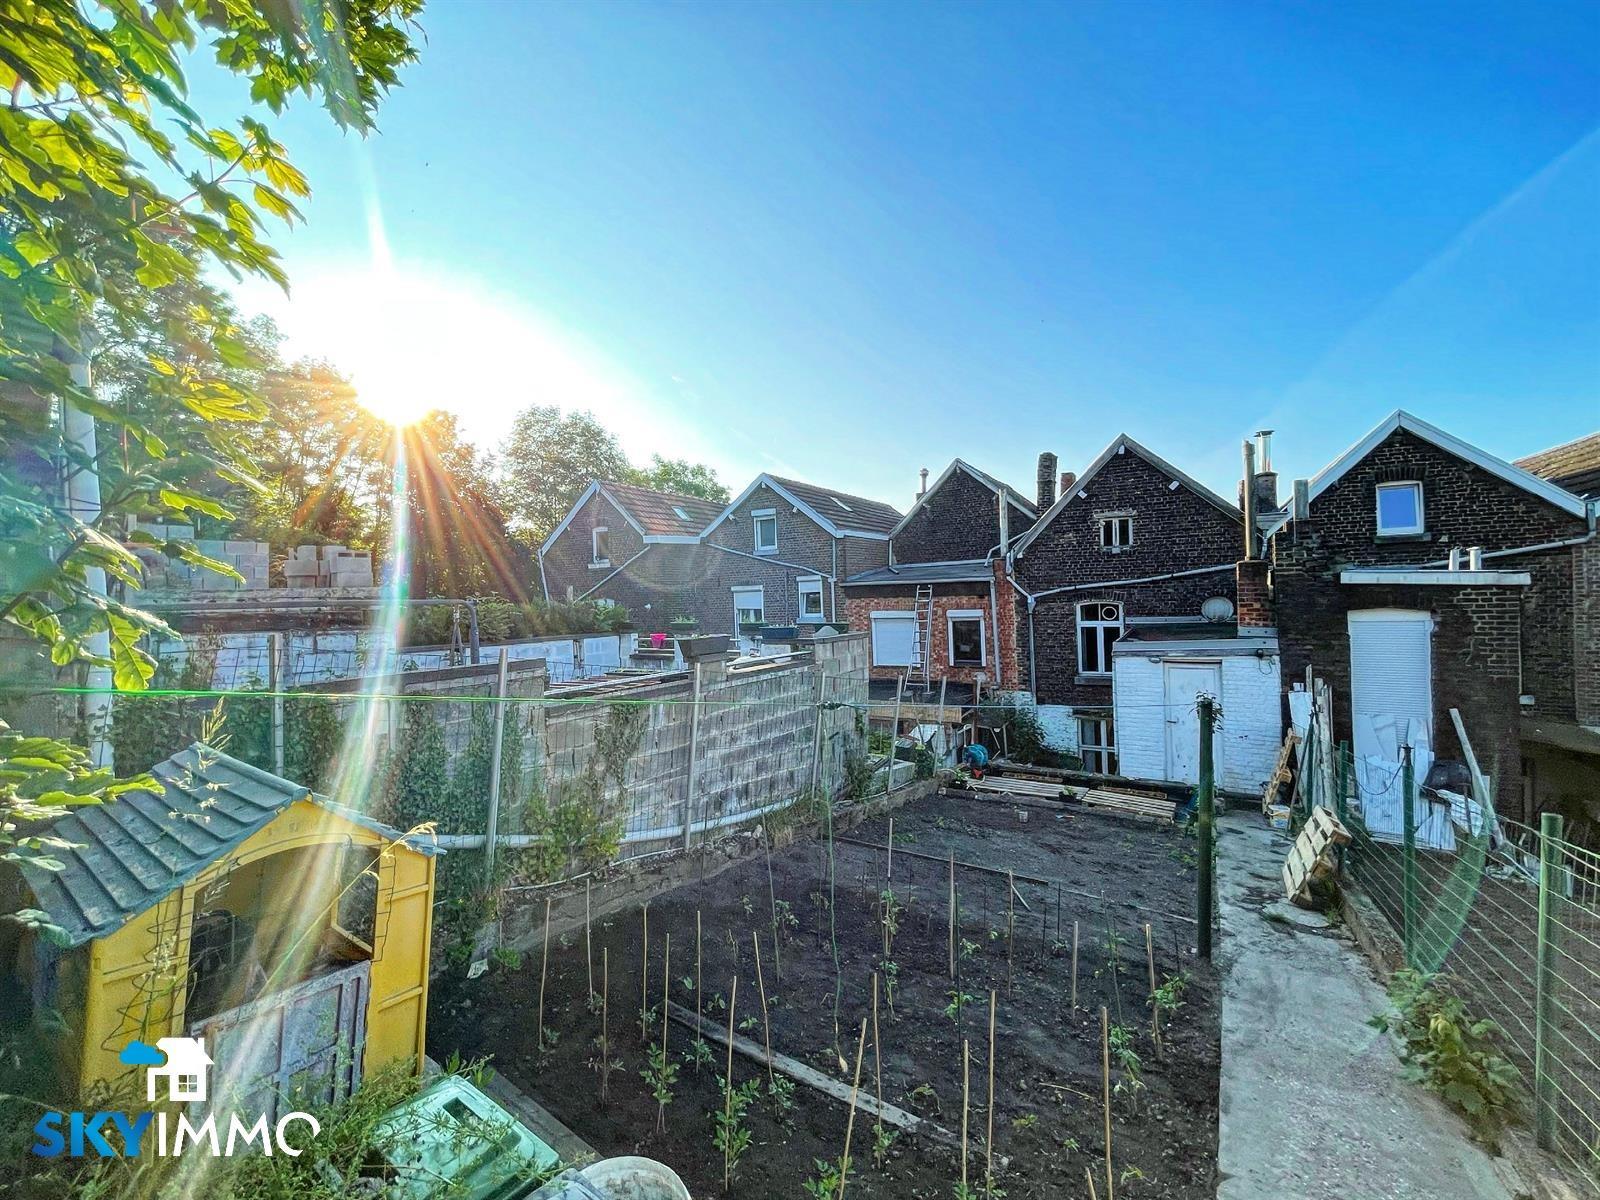 Maison - Seraing Jemeppesur-Meuse - #4383857-11